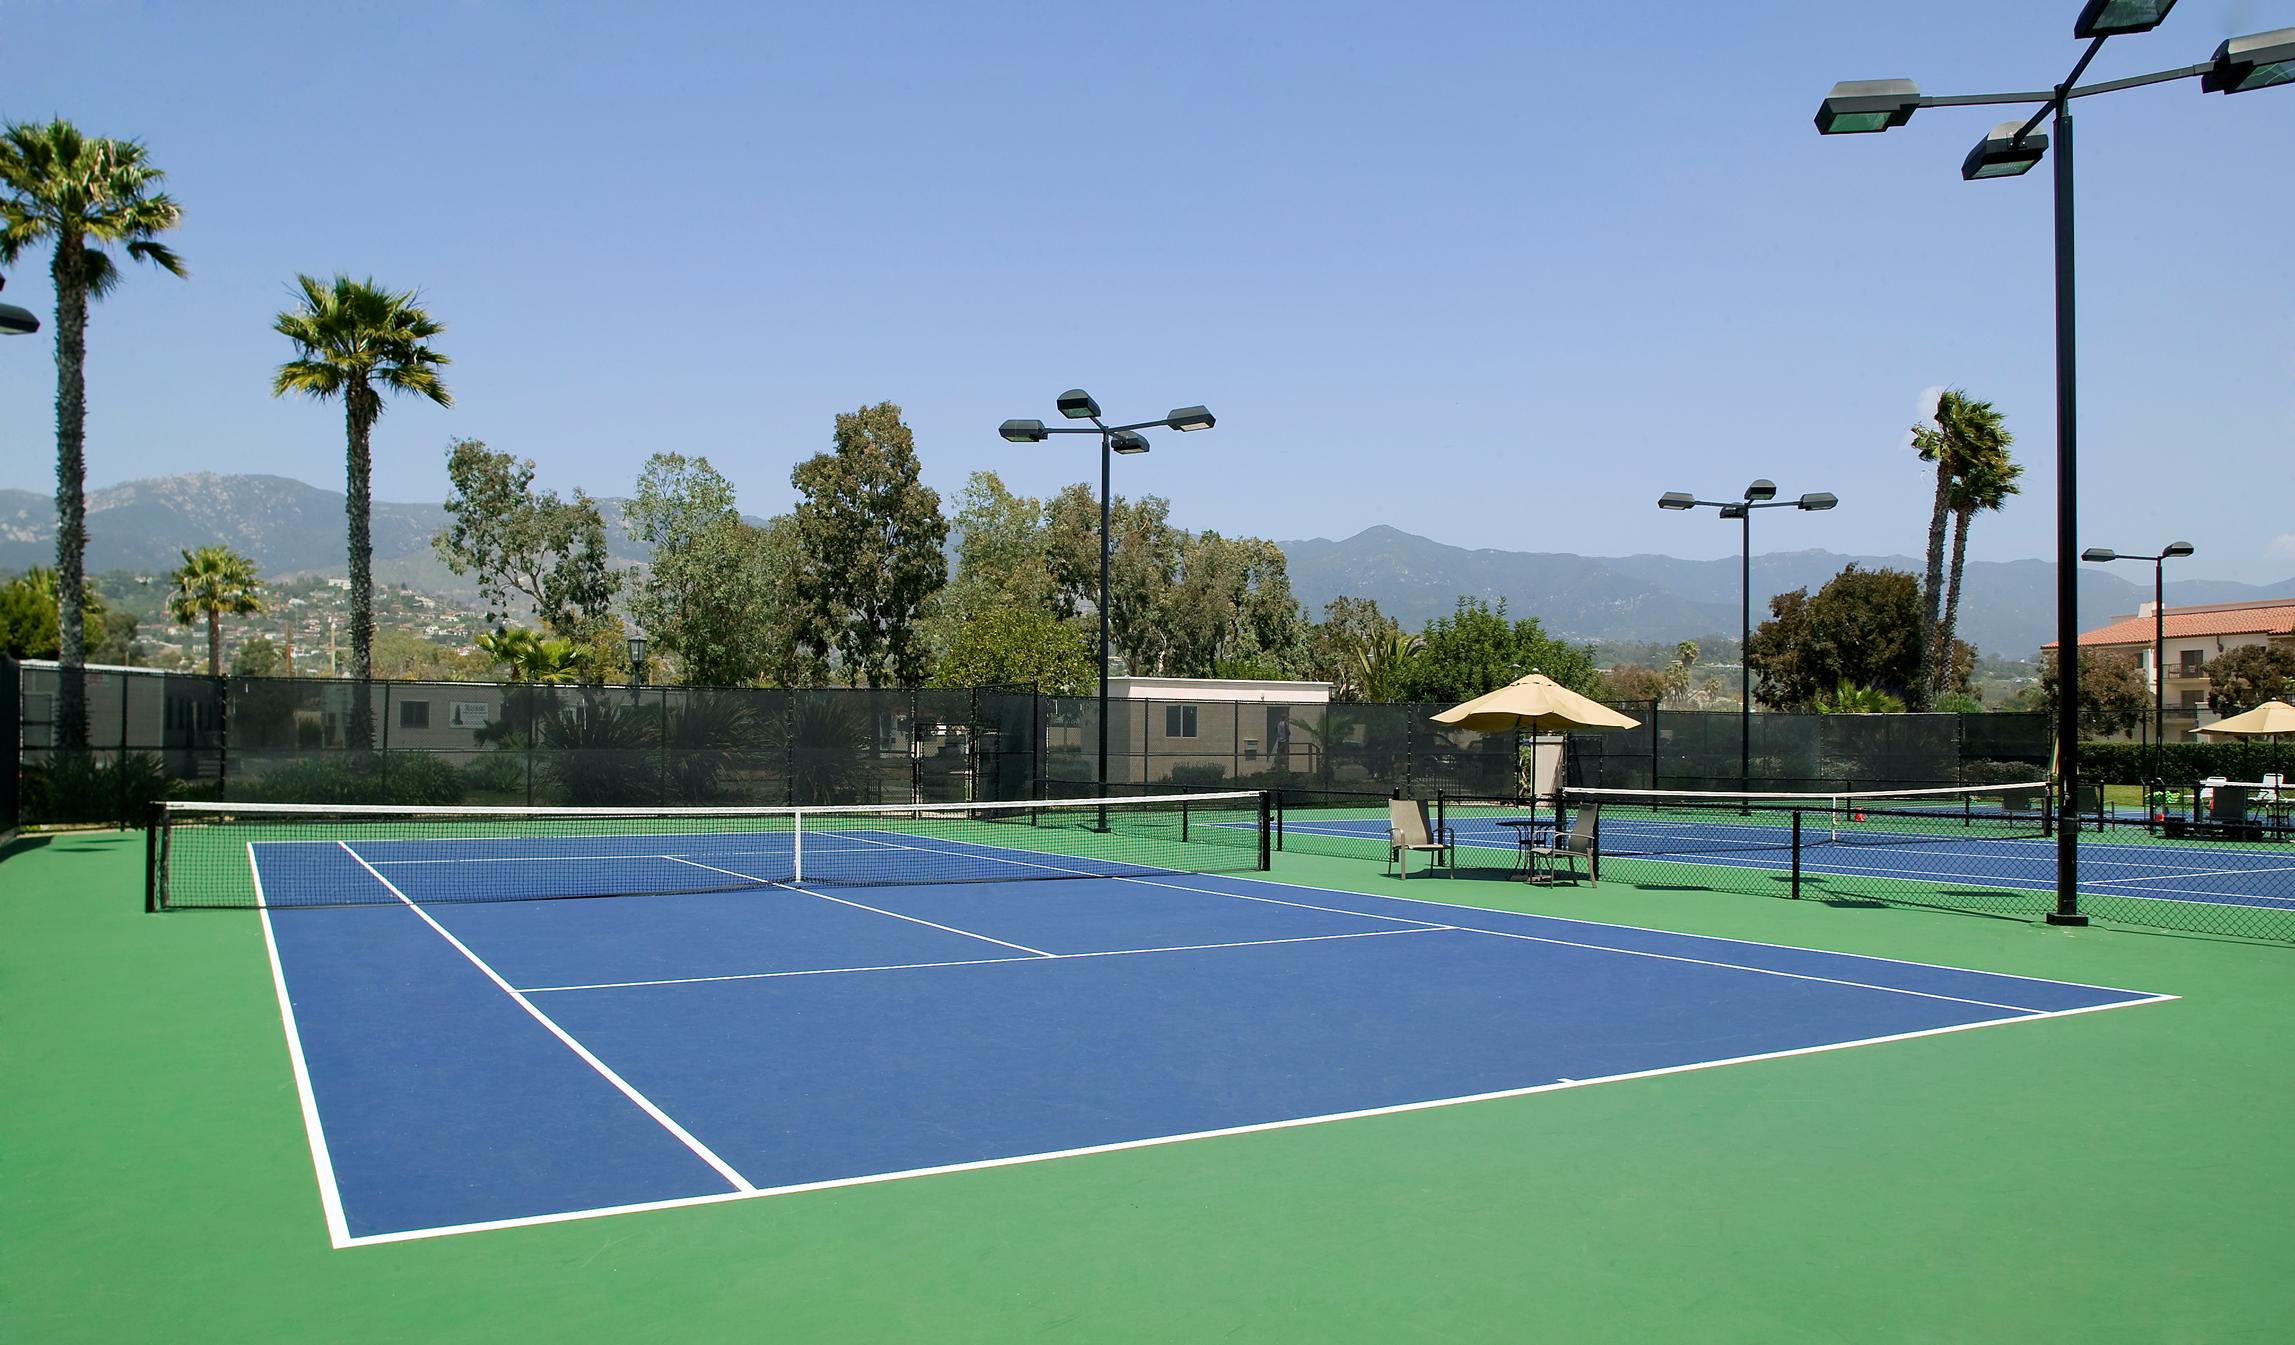 San_tennis_villa-park